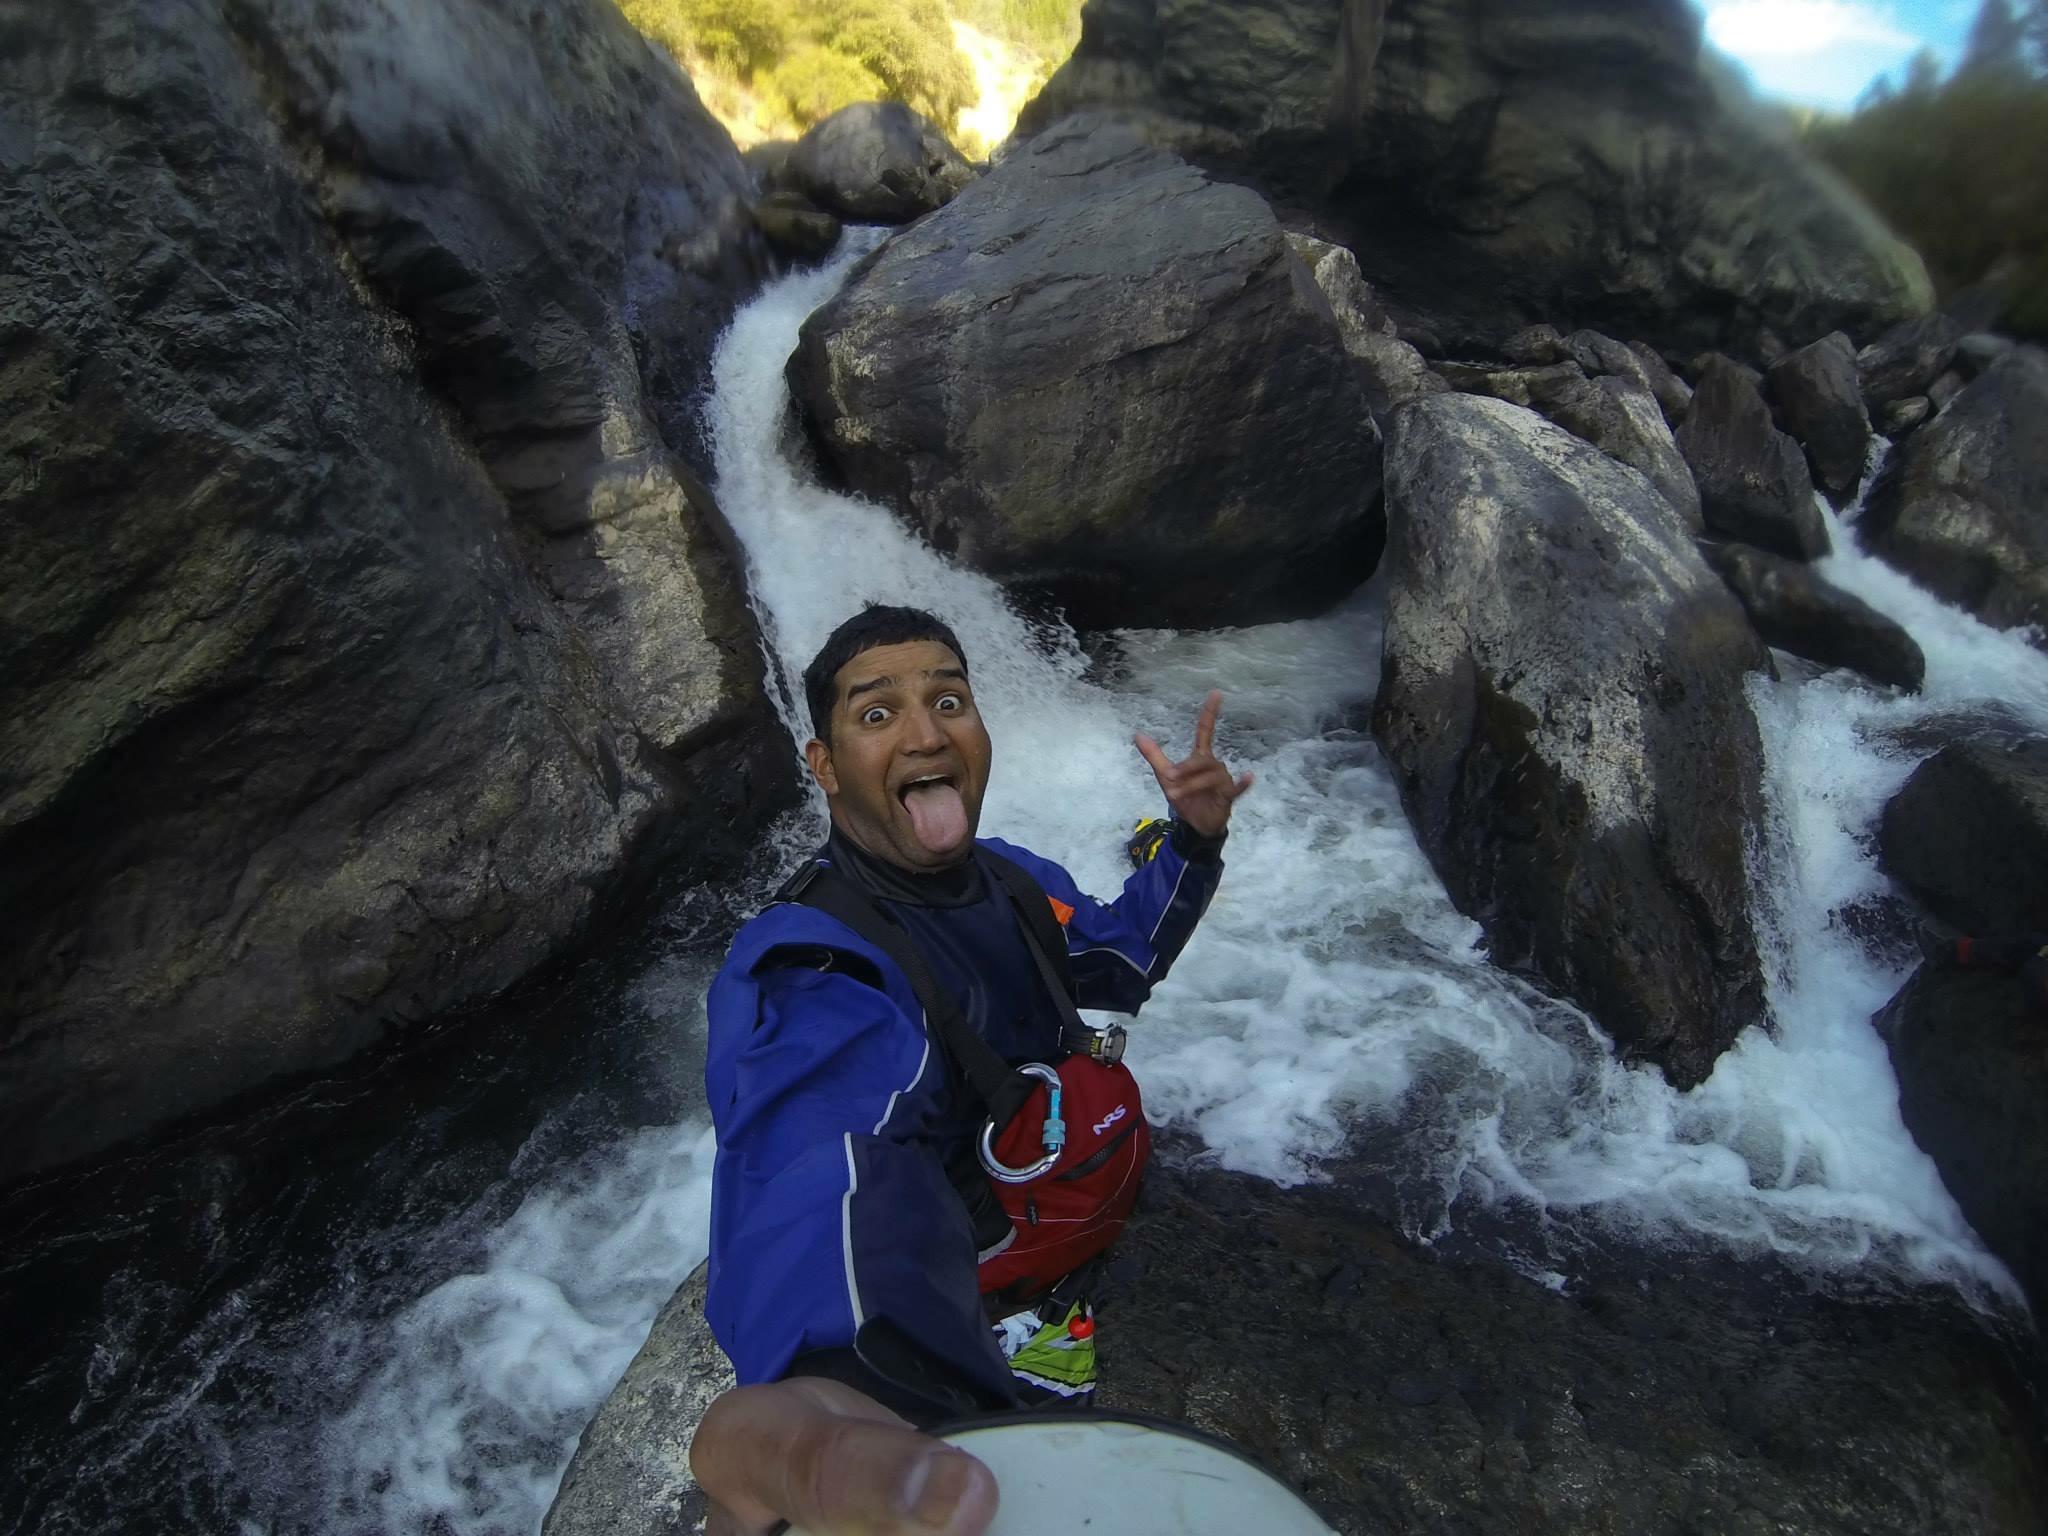 #132 - Bhupendra Singh Rana, Northfork of American River, CA (USA)